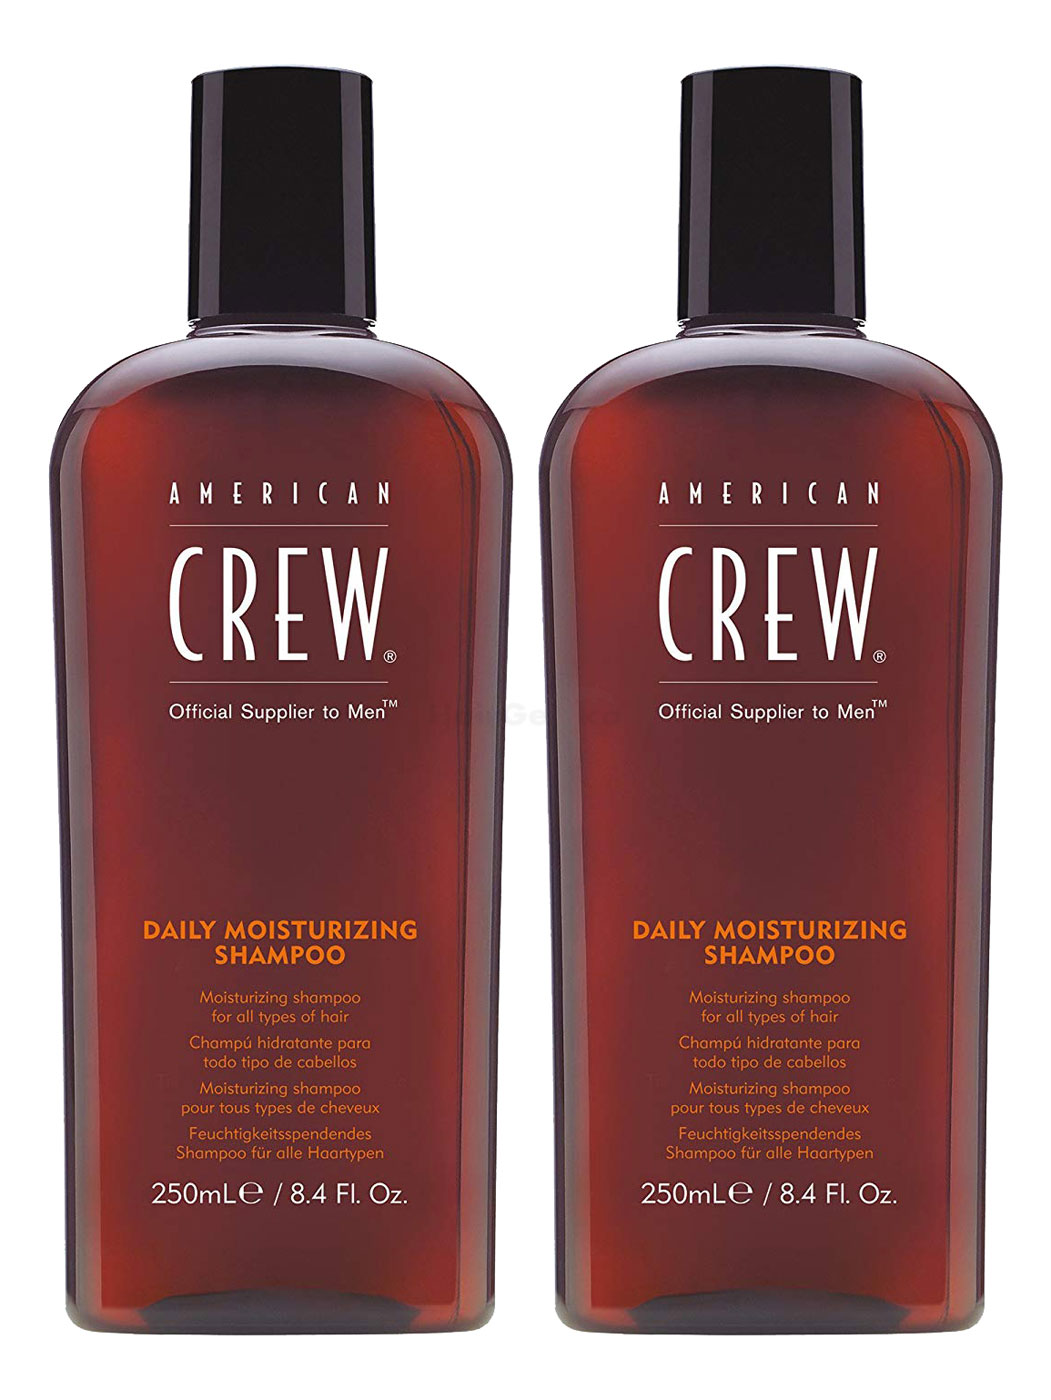 American Crew Classic Daily Moisturizing Shampoo Aktion - 2x 250ml = 500ml